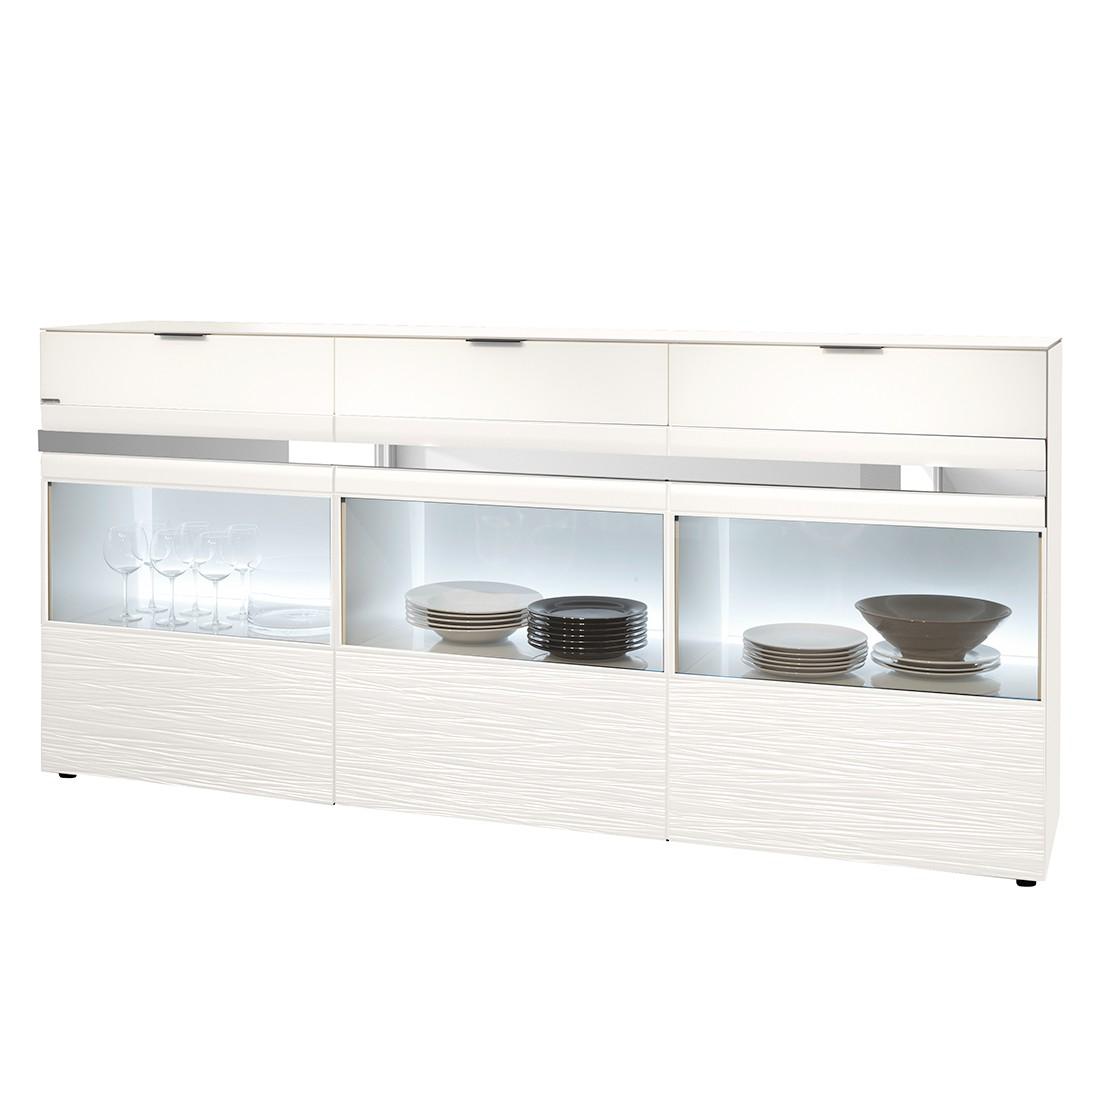 sideboard invito iii mit beleuchtung polarwei holtkamp g nstig online kaufen. Black Bedroom Furniture Sets. Home Design Ideas